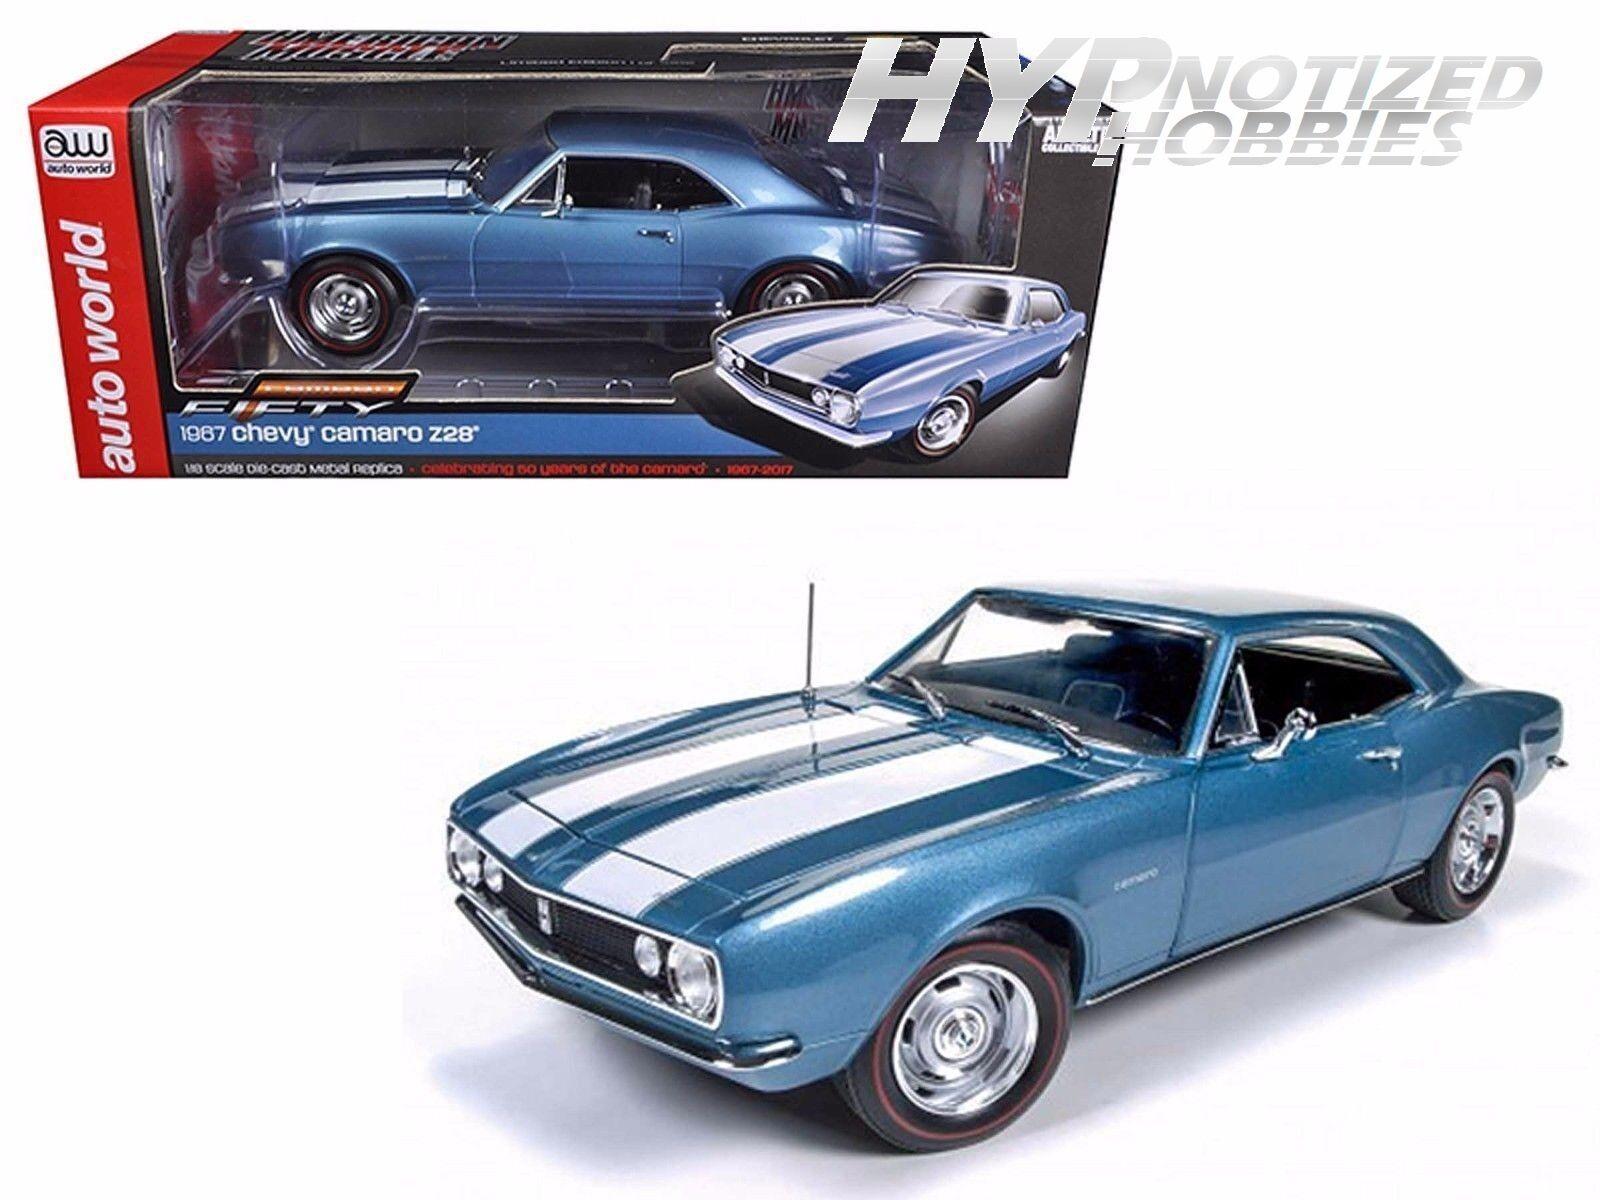 Auto le Monde 1 18 1967 Chevrolet Camaro Z28 Moulé Bleu Amm1101